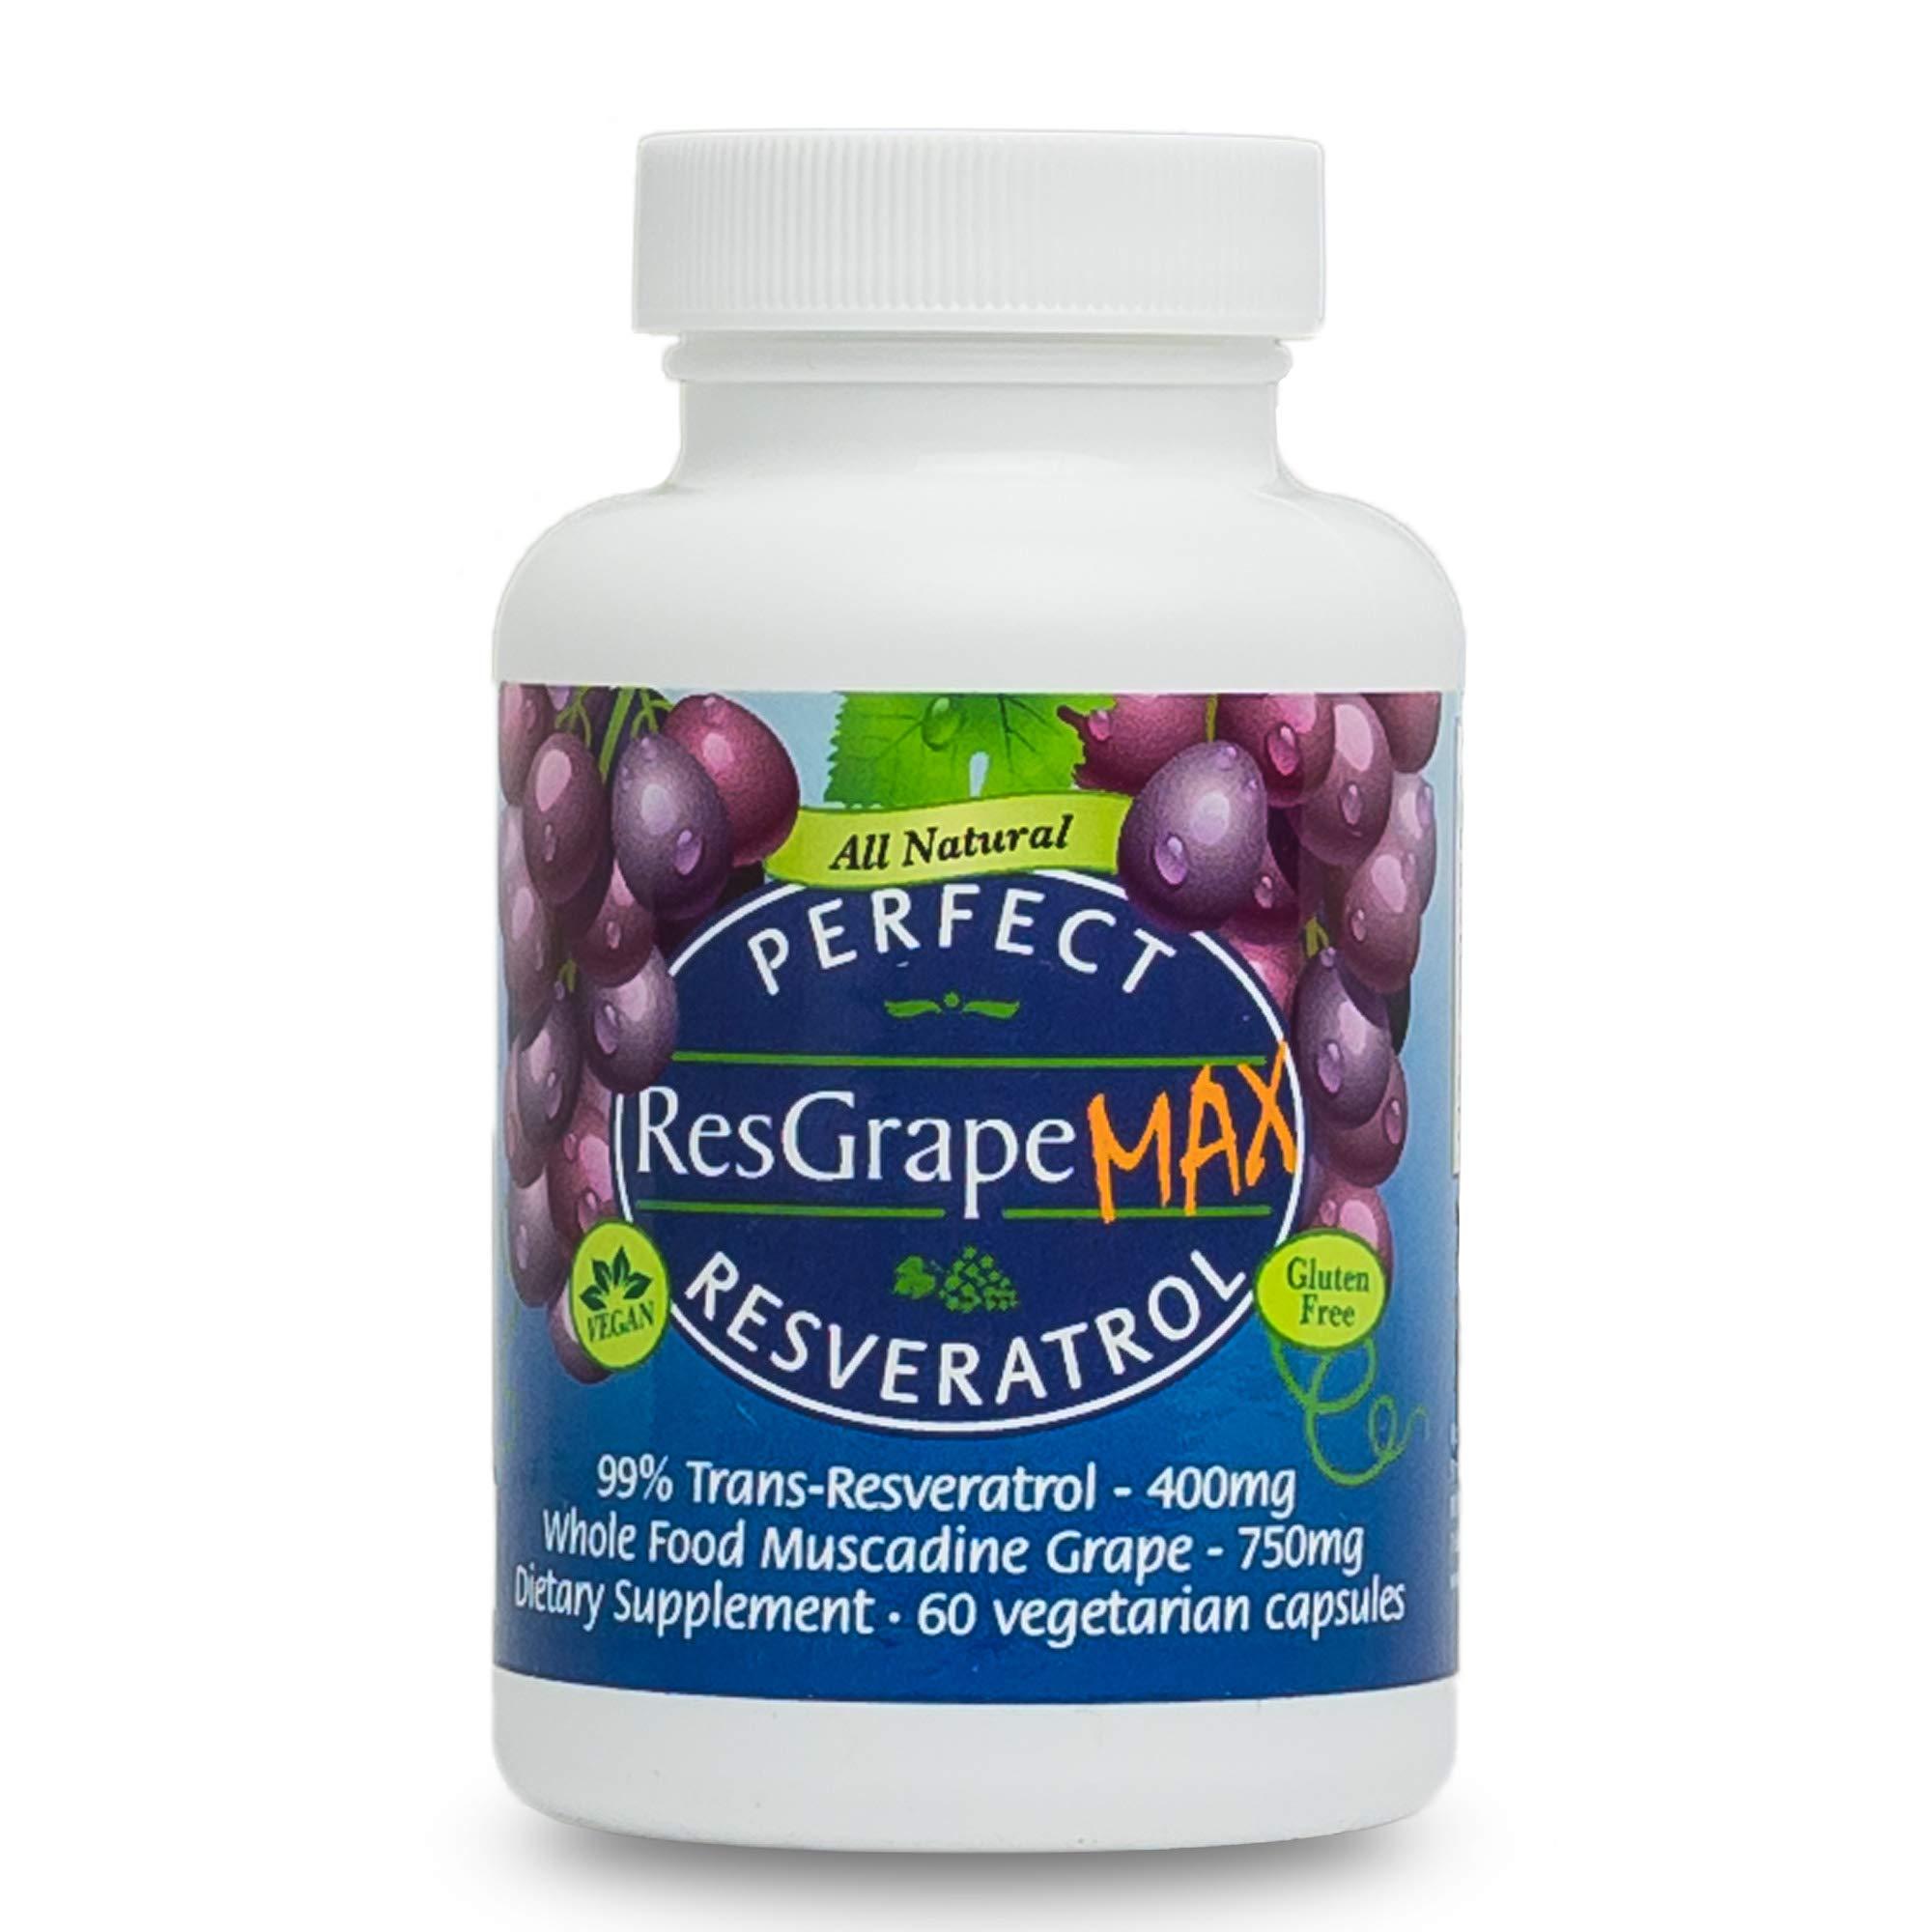 Perfect ResGrape Max ~ 99% Trans-Resveratrol & Muscadine Grape ~ Anti-Aging Supplement & Potent Antioxidant ~ 60 Vegetable Capsules